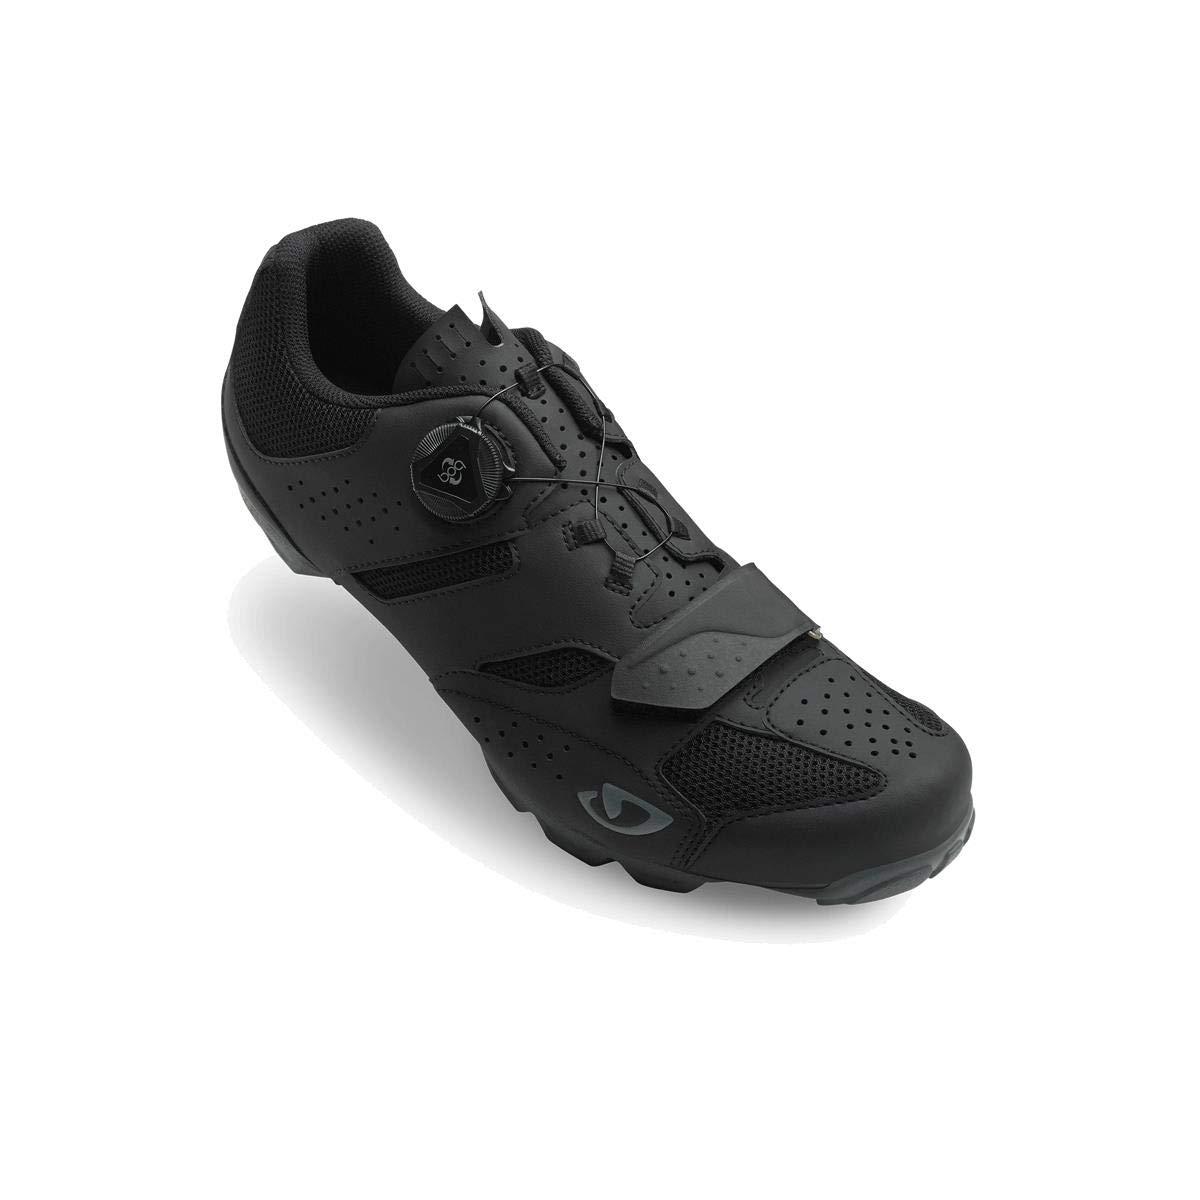 Giro Herren Herren Herren Cylinder Hv Radsportschuhe - Mountainbike Schwarz B075RPZRB3  7ed041